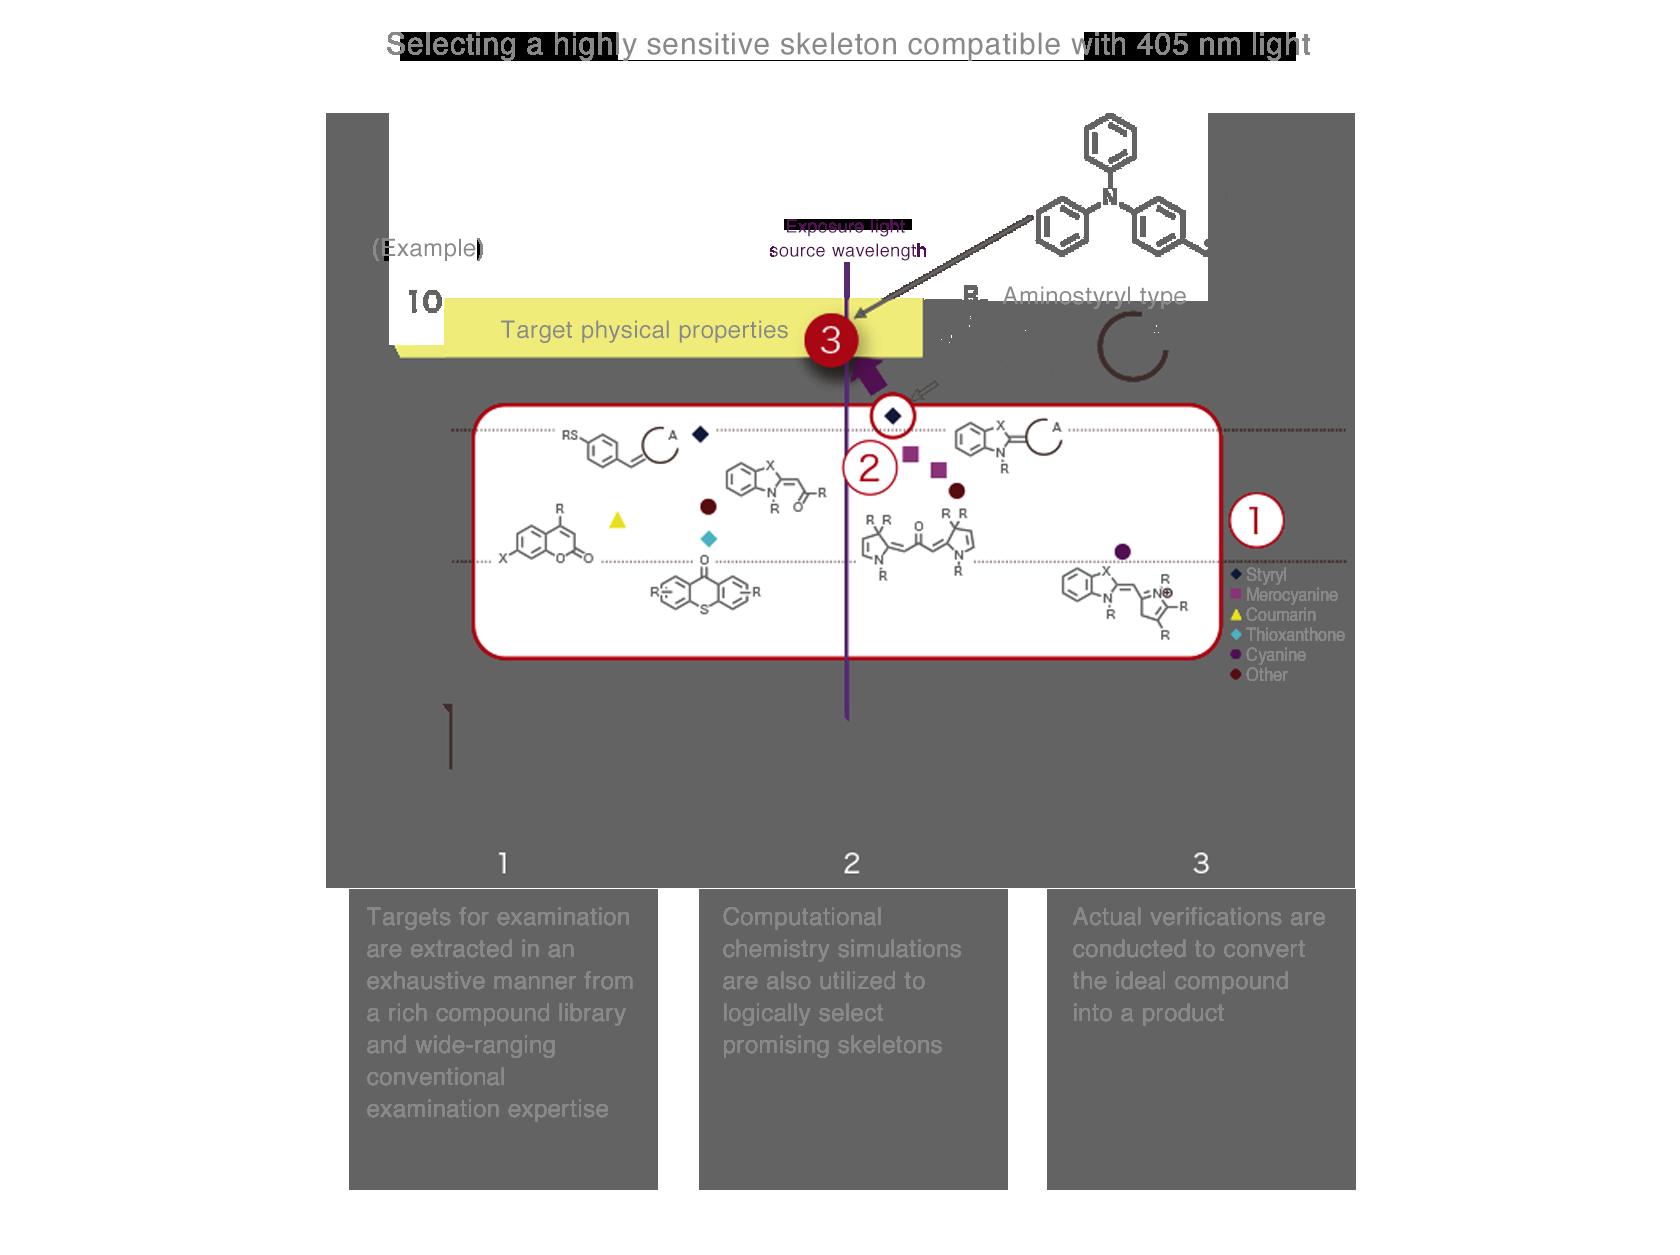 [image] Molecular design capability